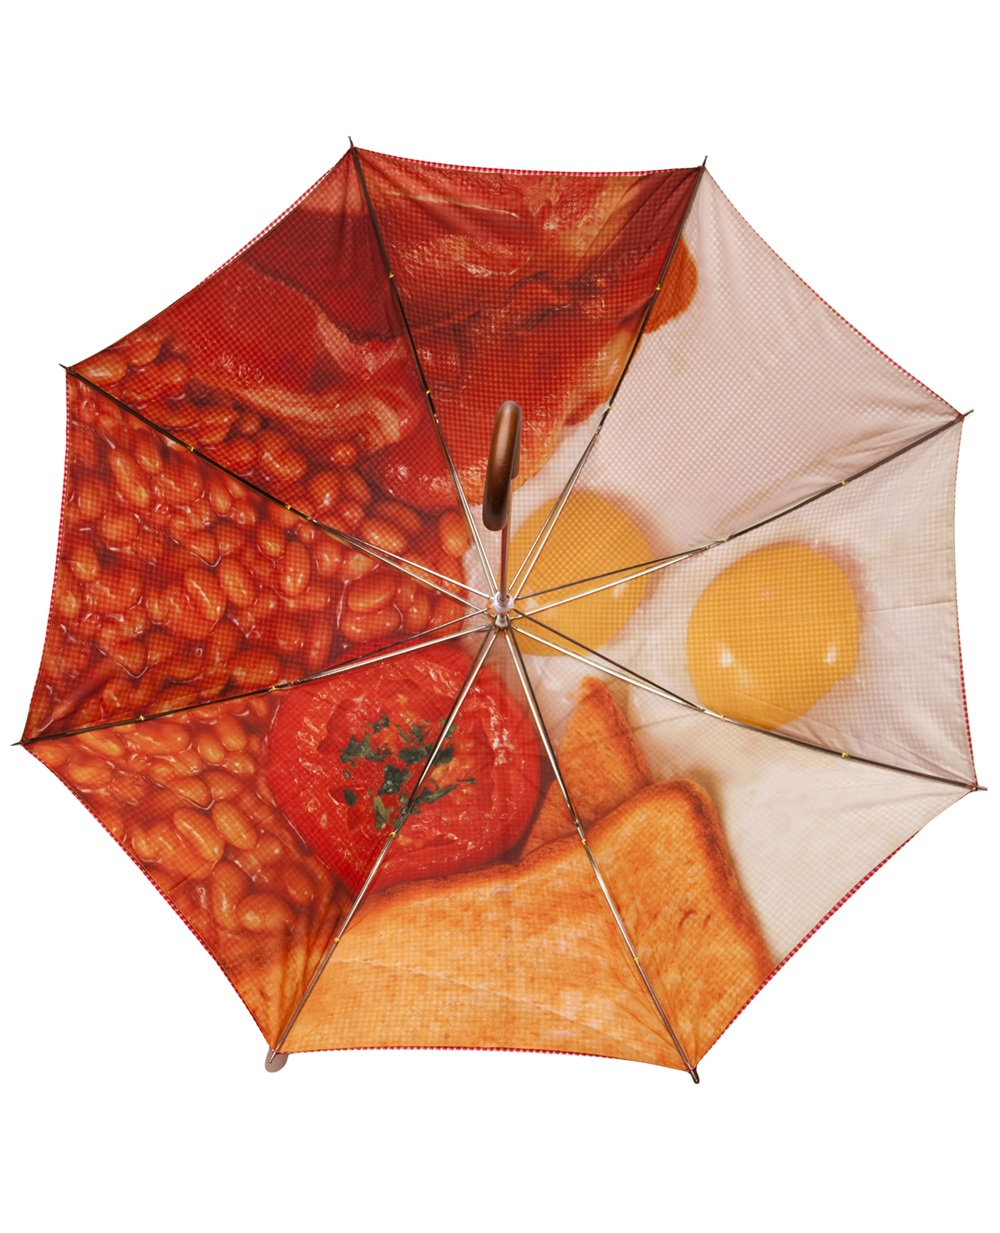 london-undercover-english-breakfast-umbrella-10058373_305304_1000